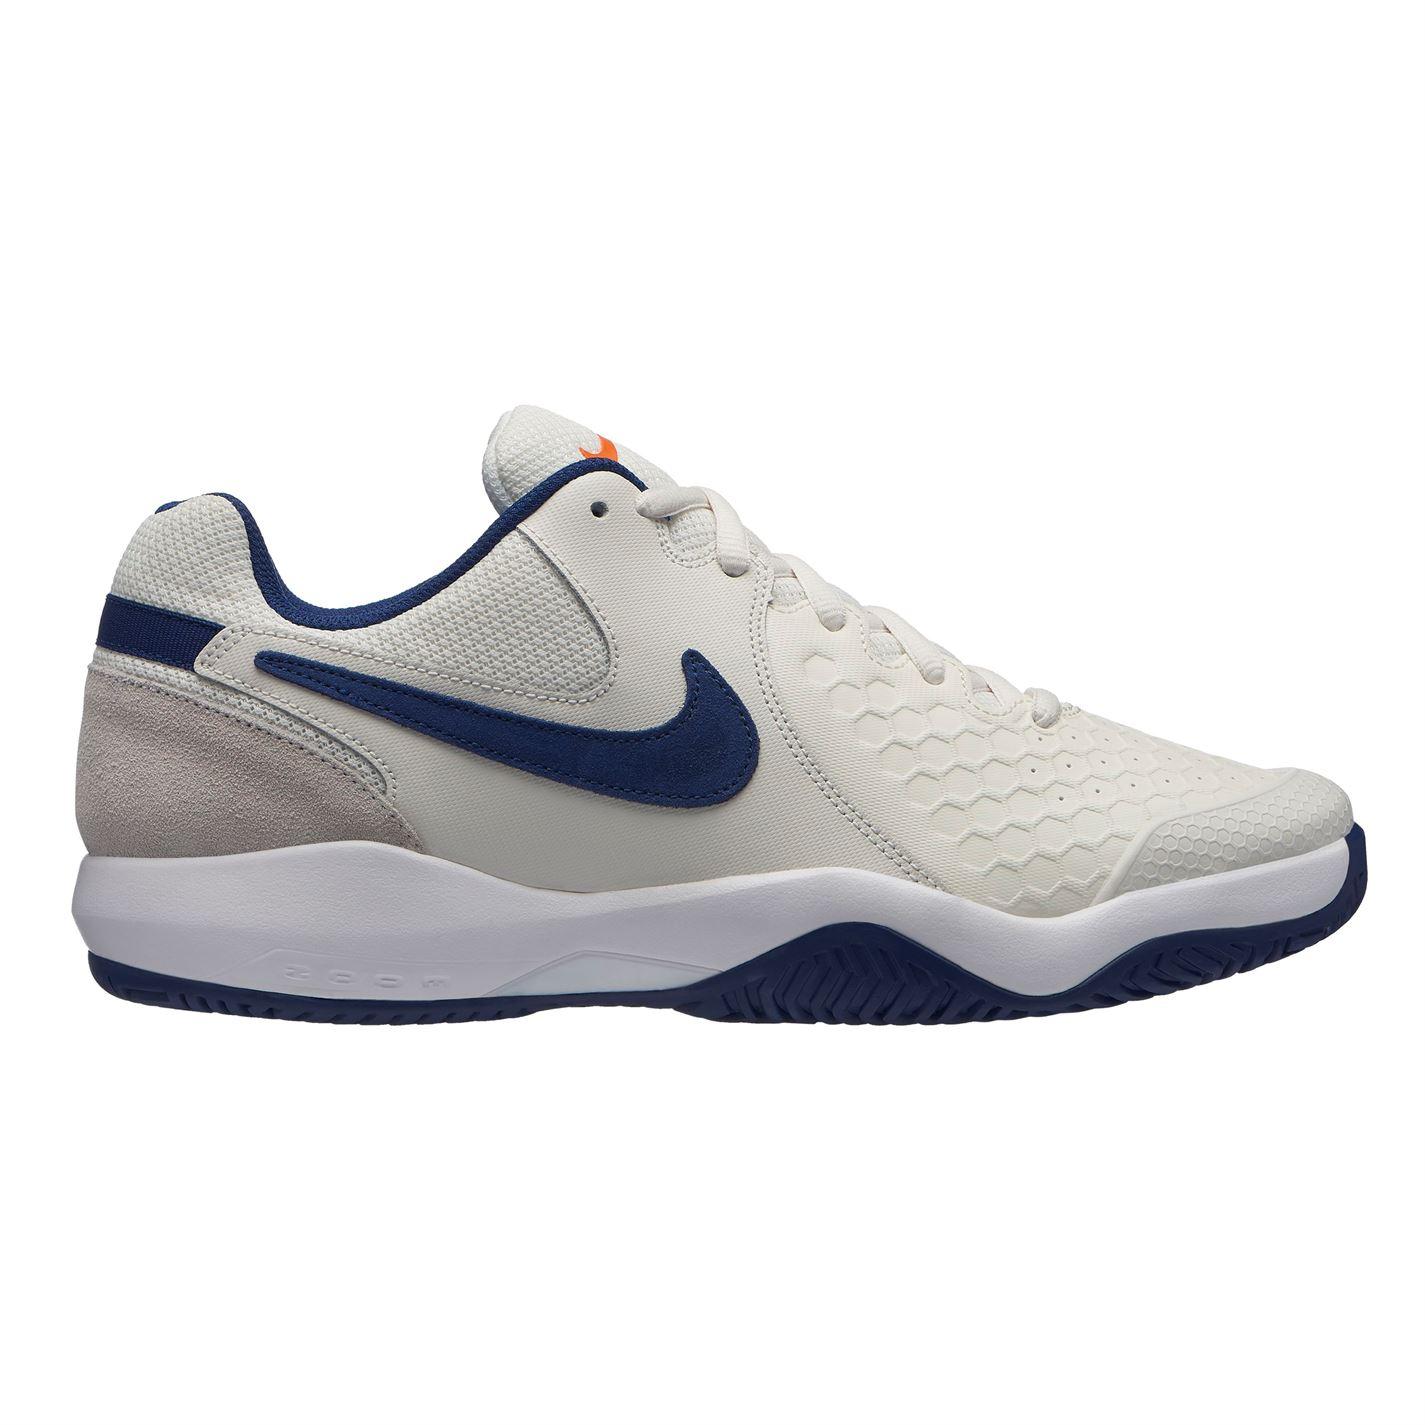 Nike Air Zoom Resistance pánské tenisové boty